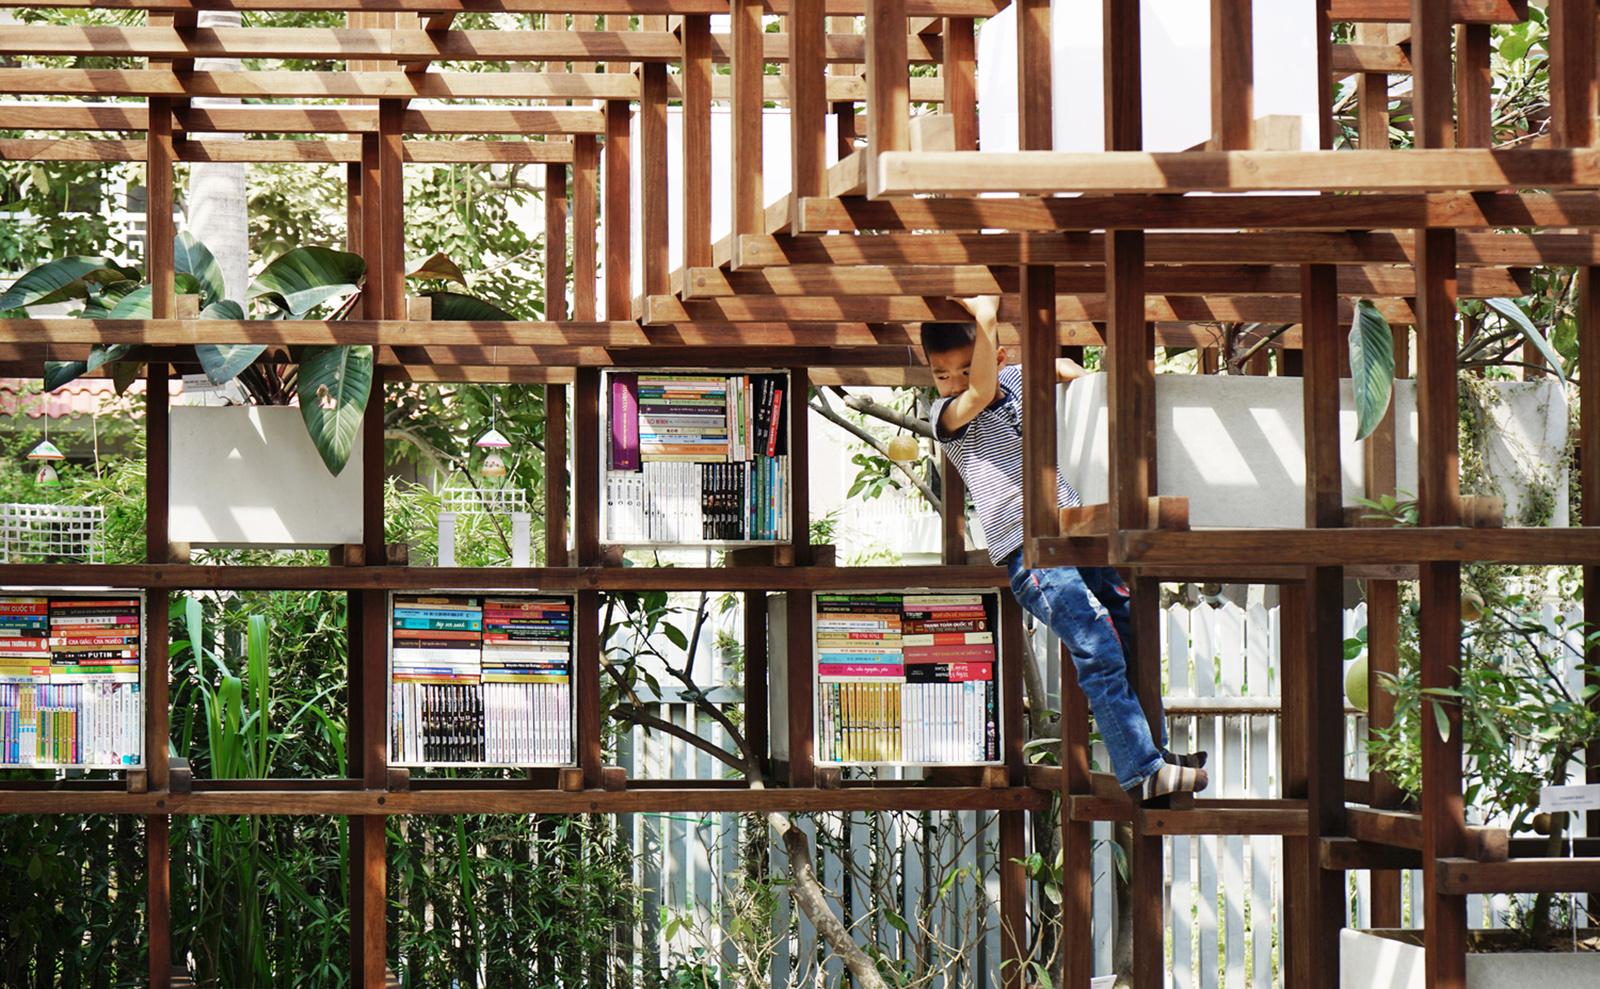 The Elegant, Playful, Environmentally Friendly VAC Library in Hanoi, Vietnam